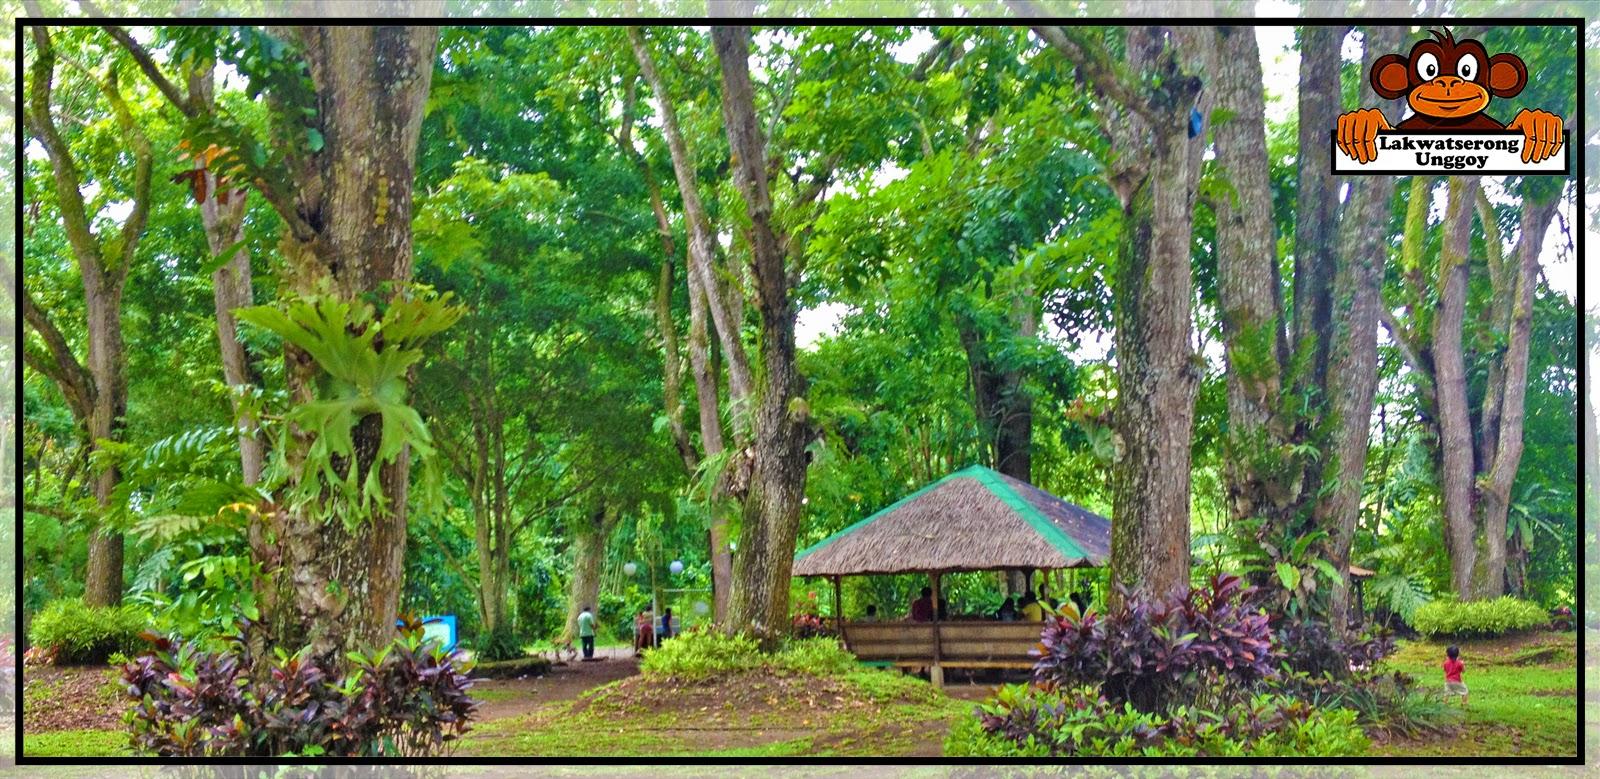 lakwatserong unggoy diy solo trip davao city day3